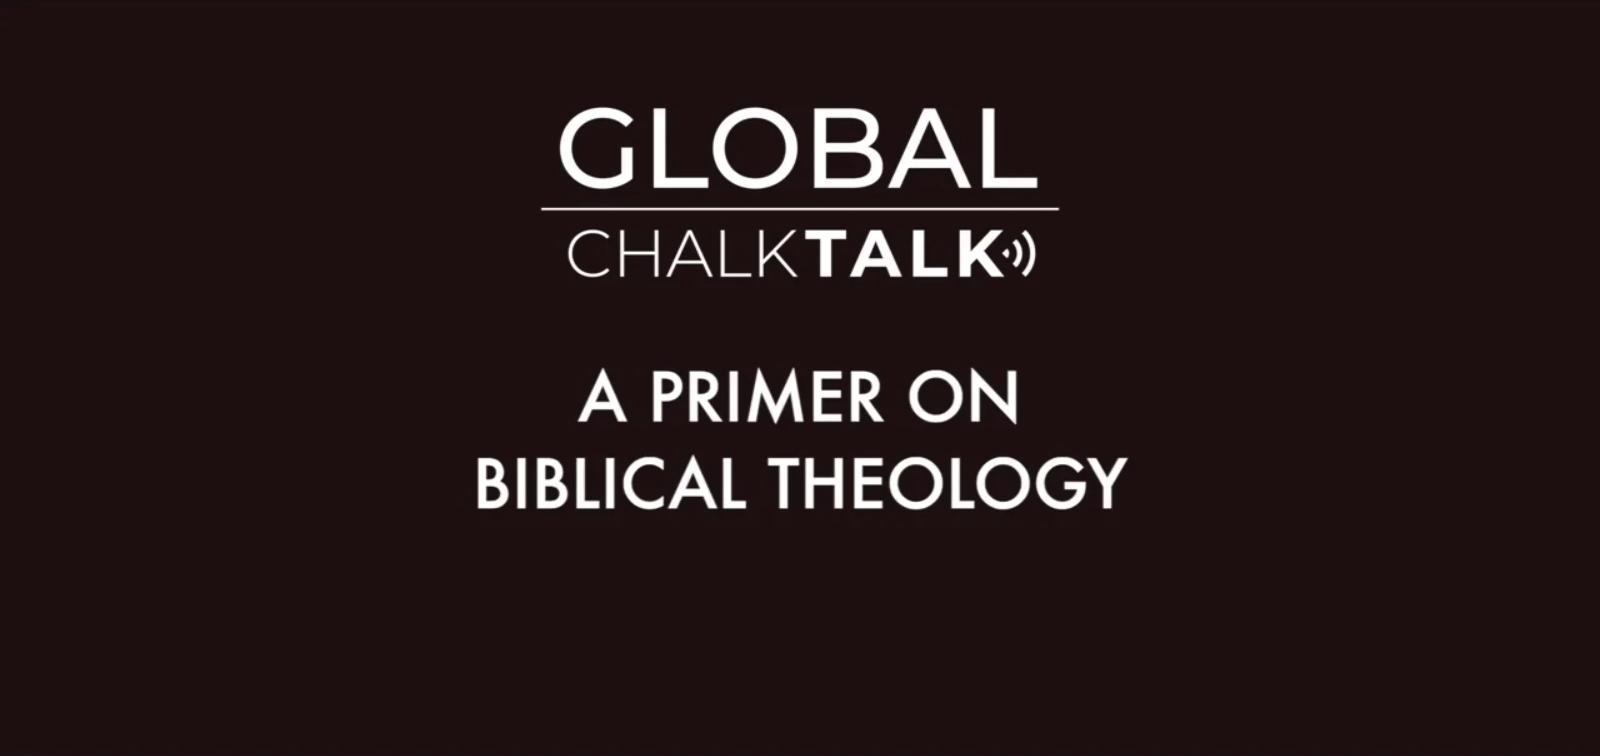 Primer of Biblical Theology